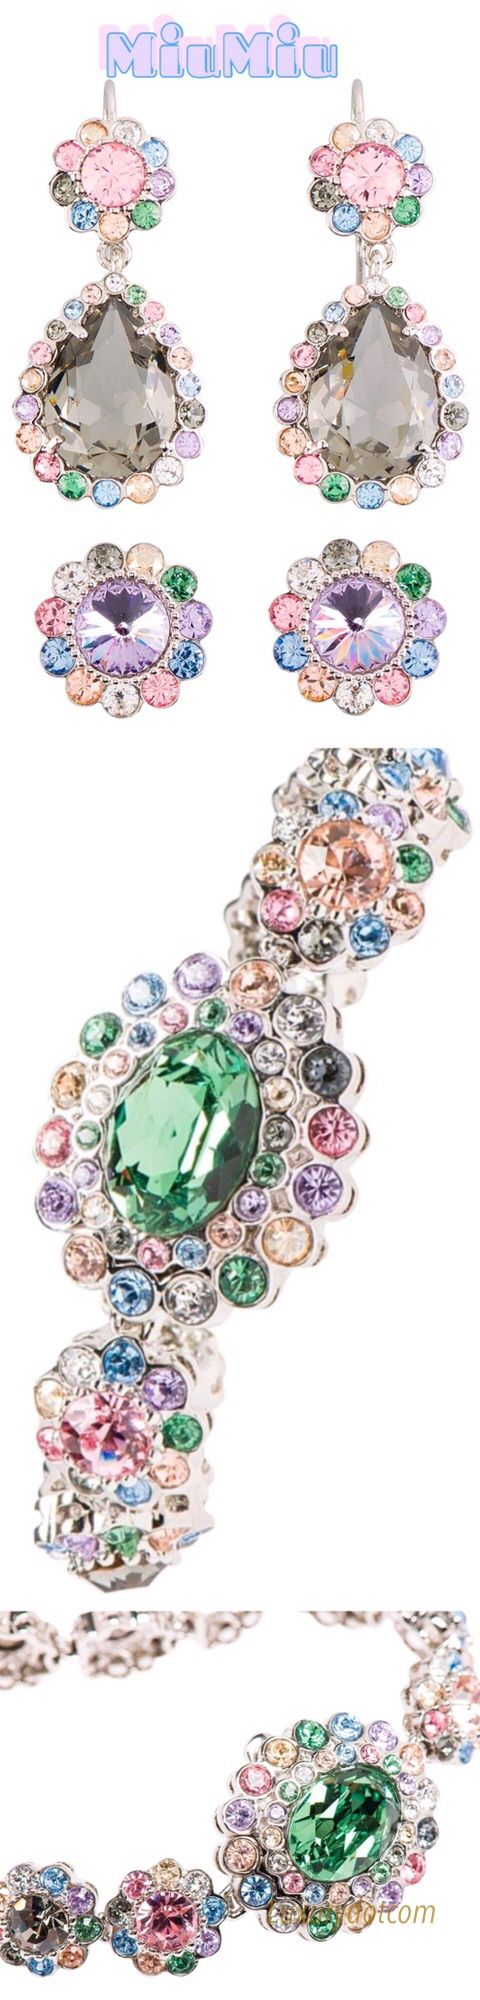 MiuMiu luxury designer accessories Collage by #Luxurydotcom